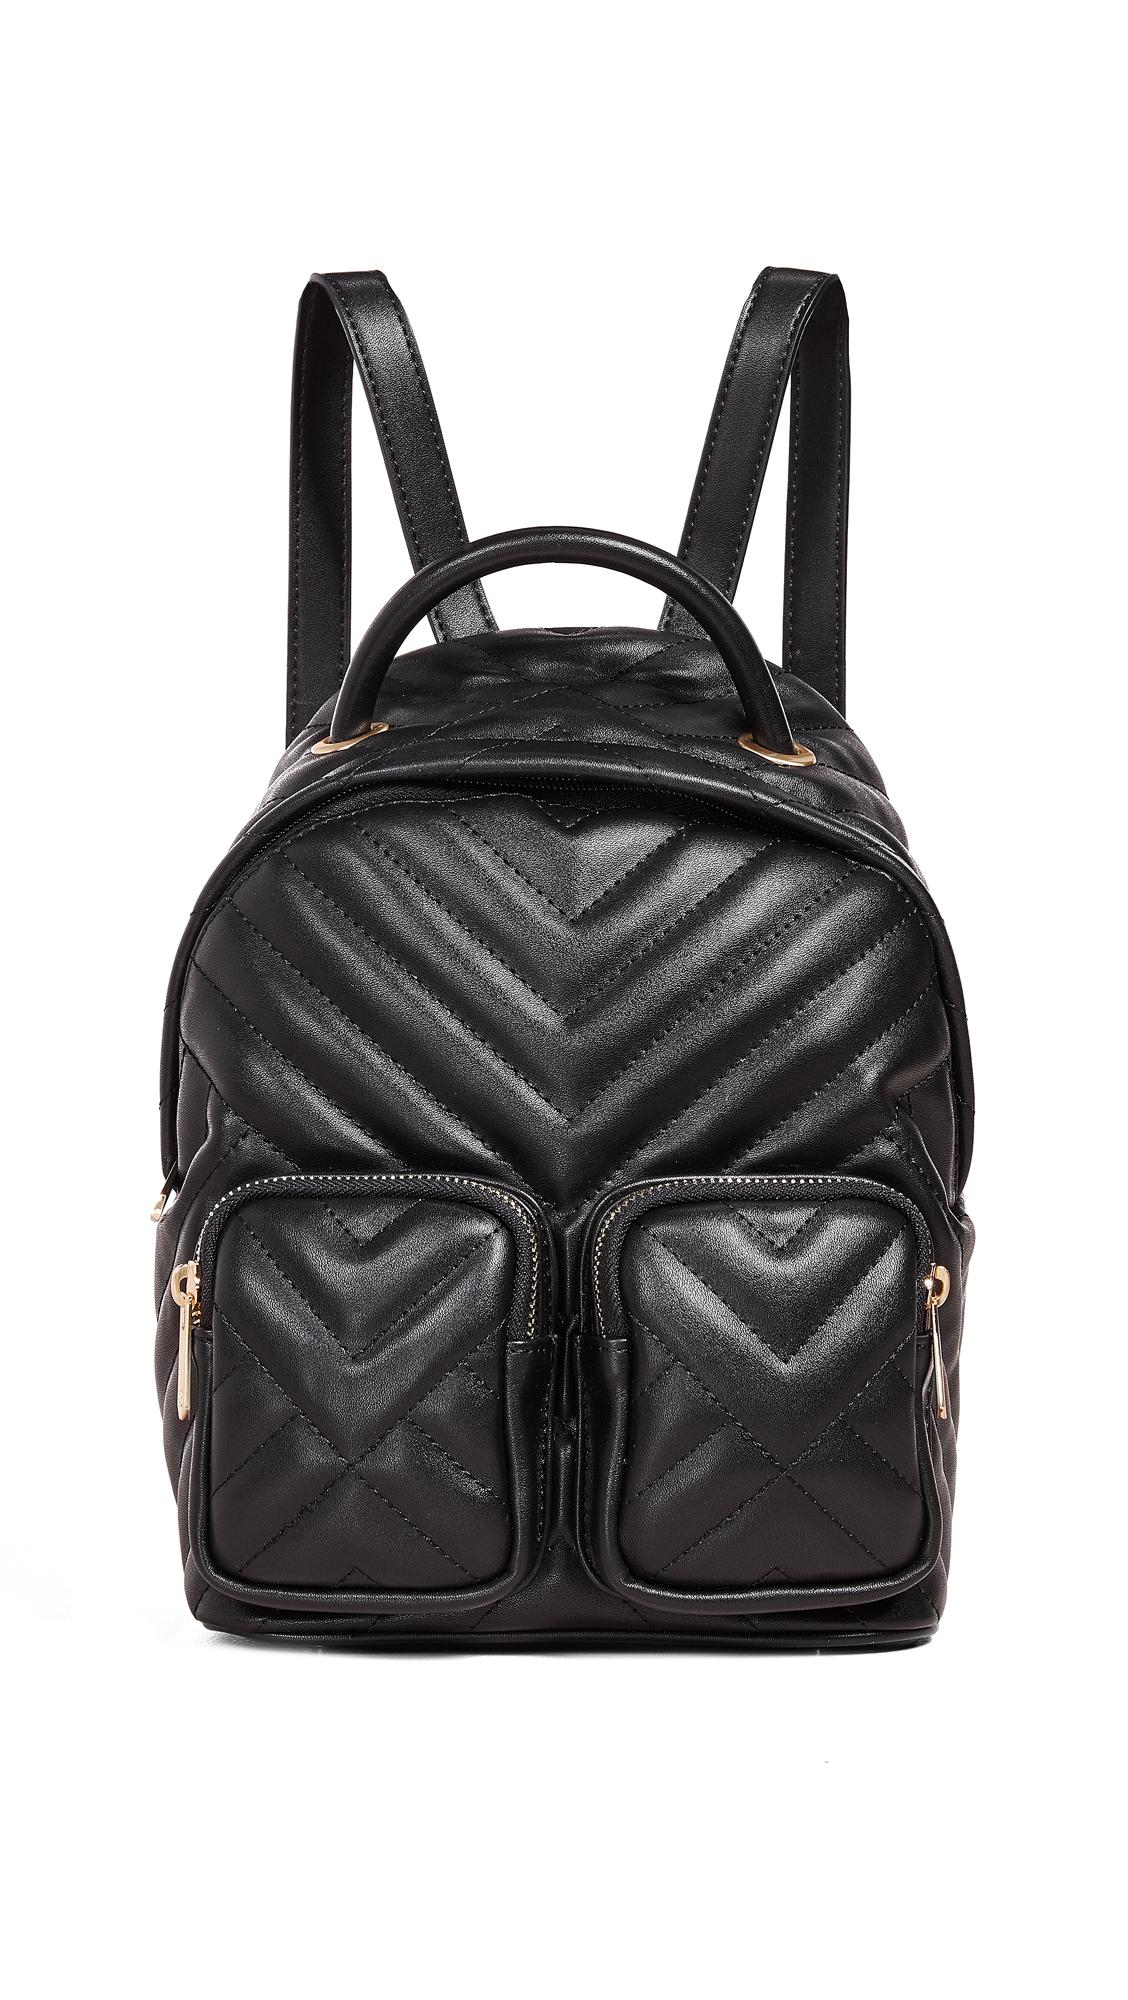 Sam Edelman Keely Backpack - Black